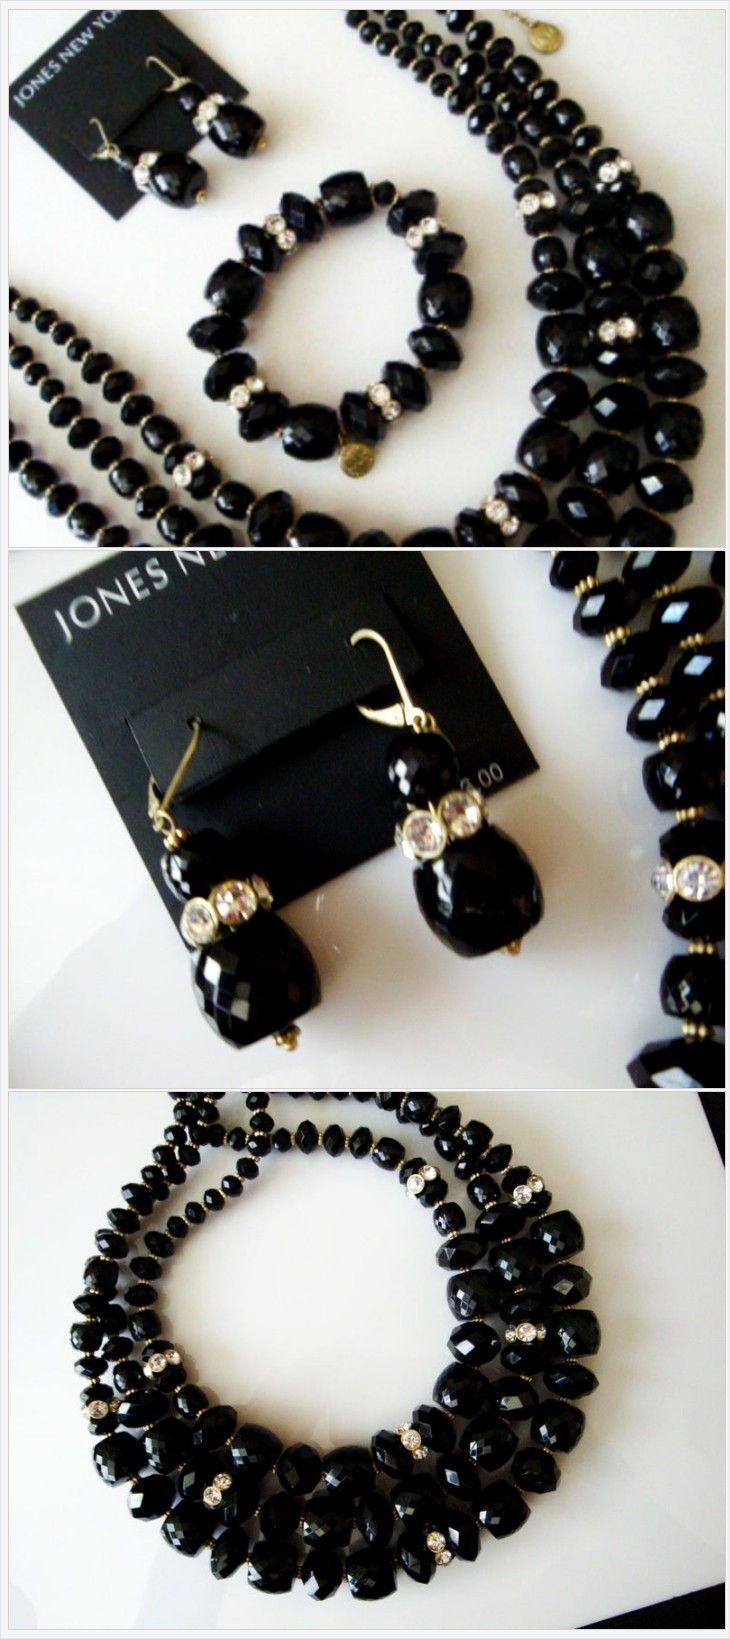 Jones New York Black Necklace Bracelet Earrings Set Black Faceted Bead and Rhinestone JNY Statement Necklace Bracelet and Dangle Earrings